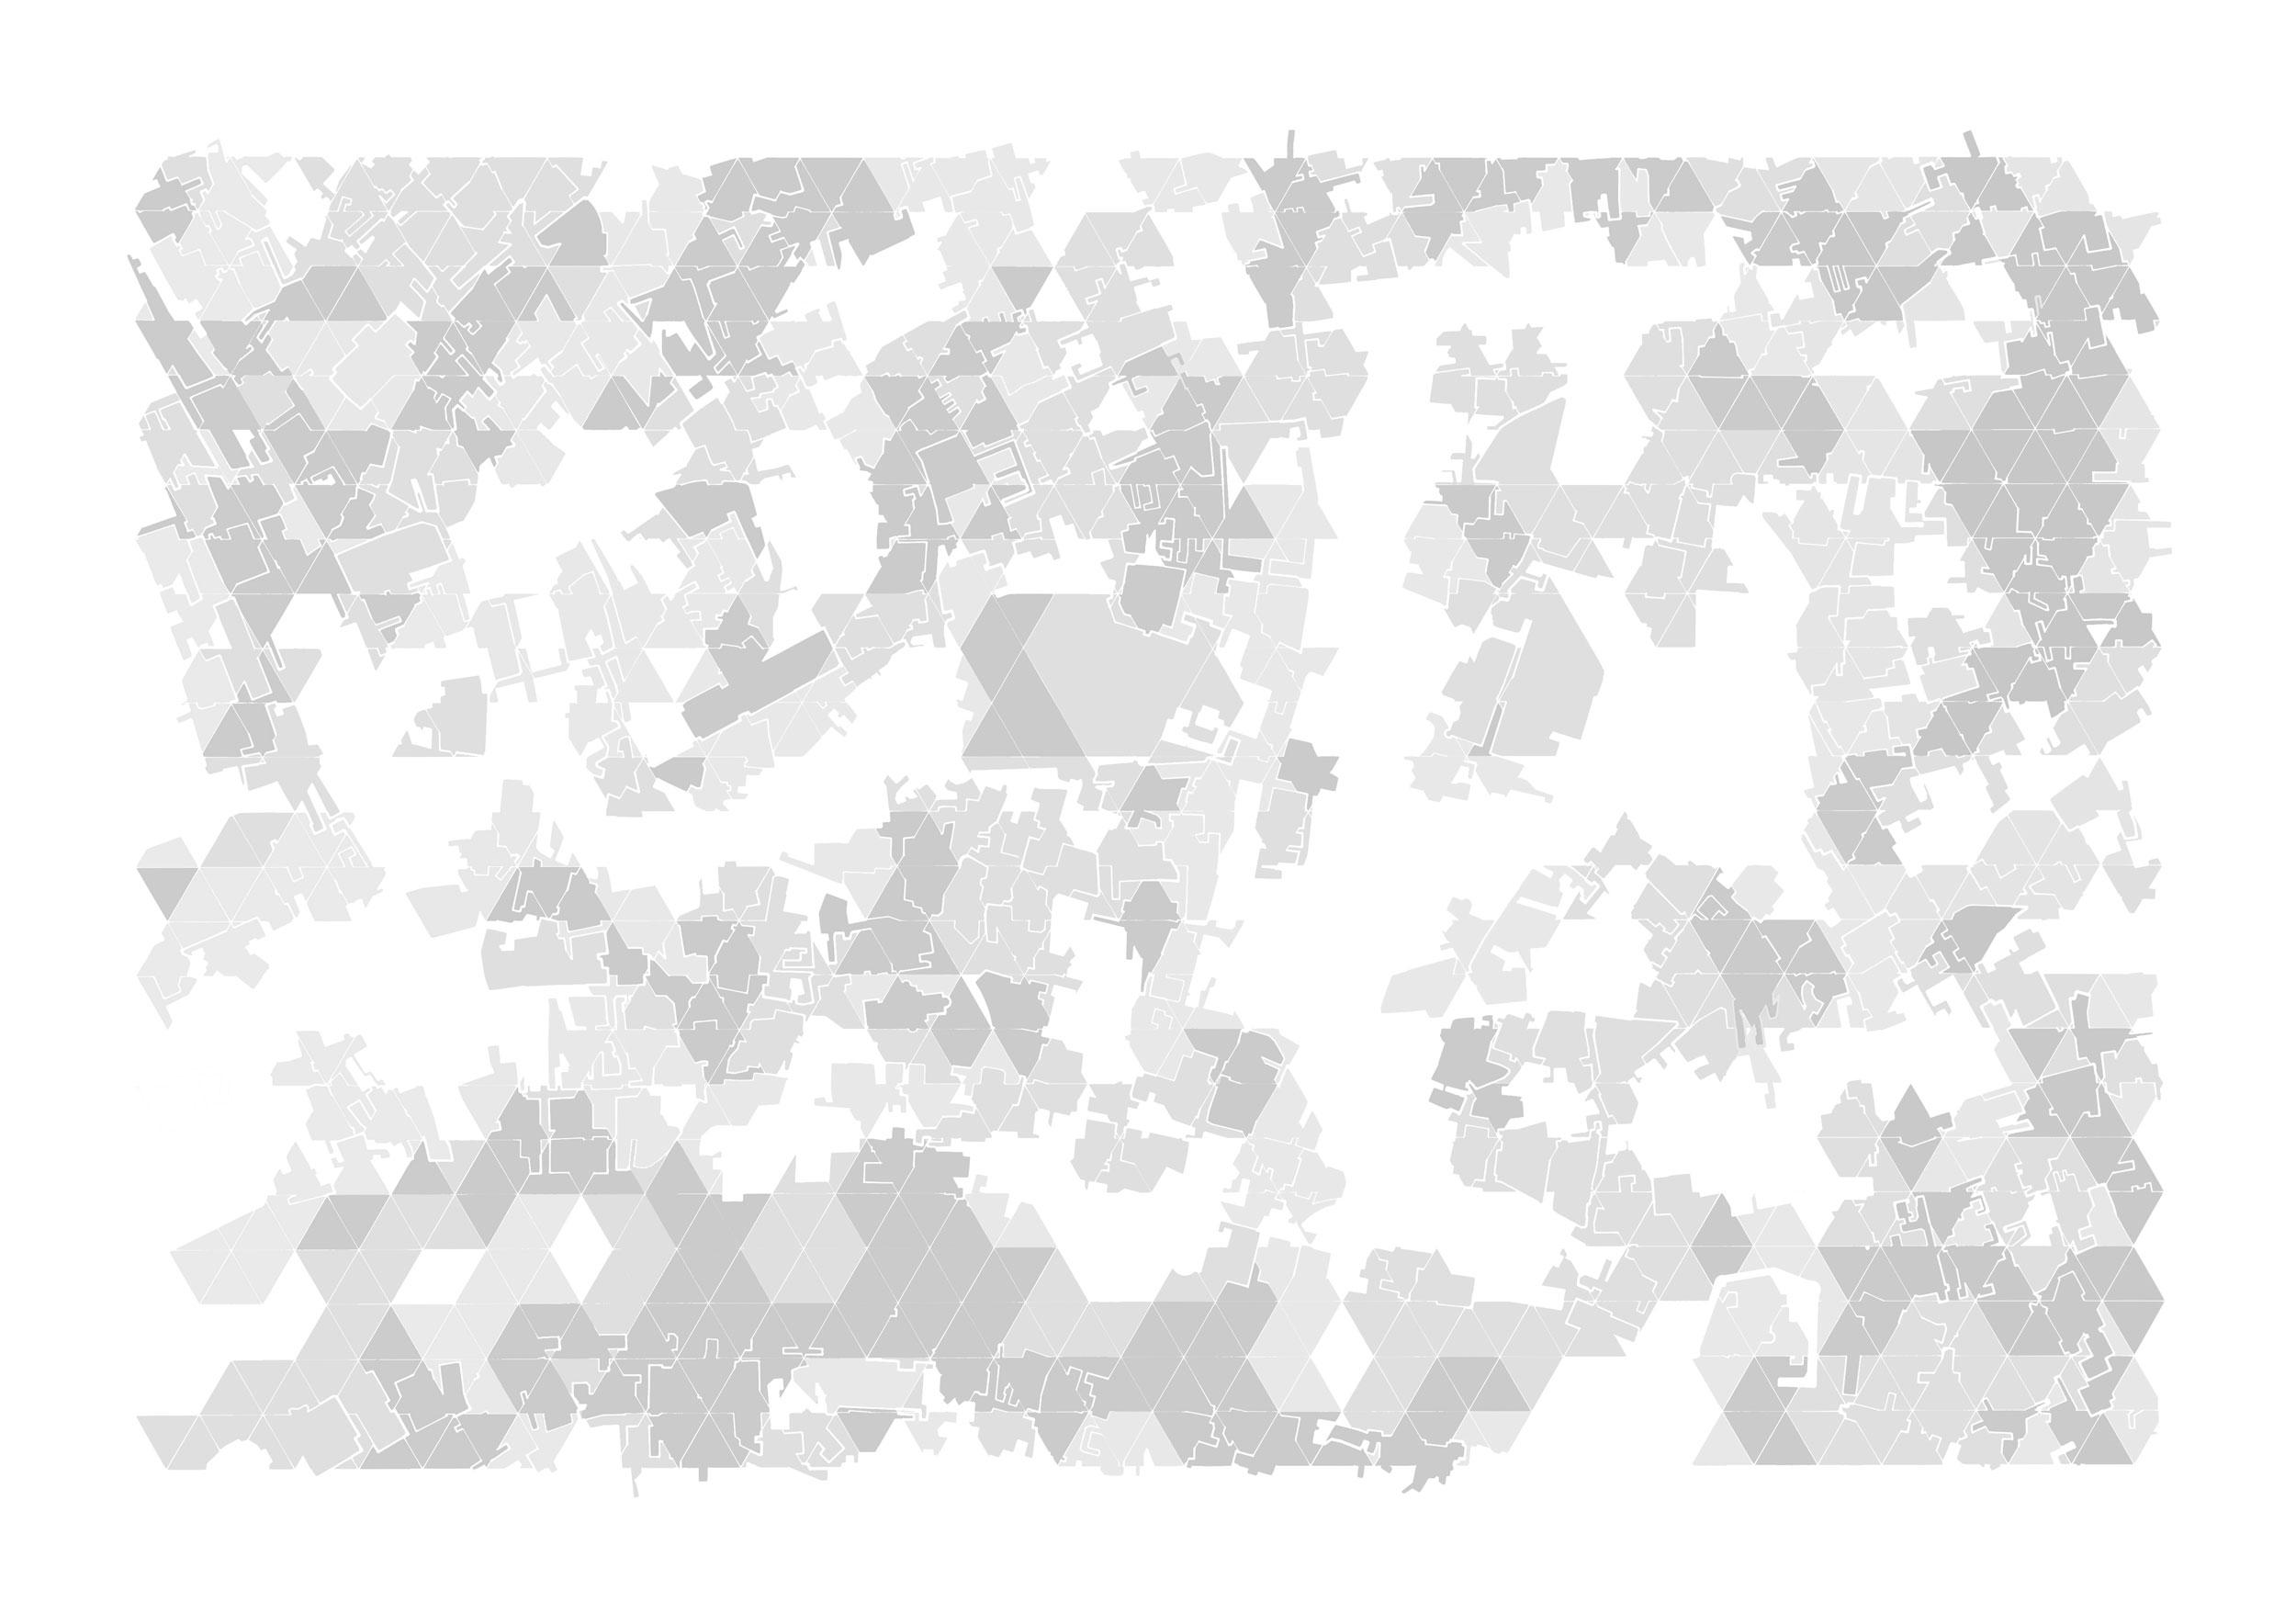 City Of Blocks 3 (2017) - 841 x 594mm, digitally processed hand drawing